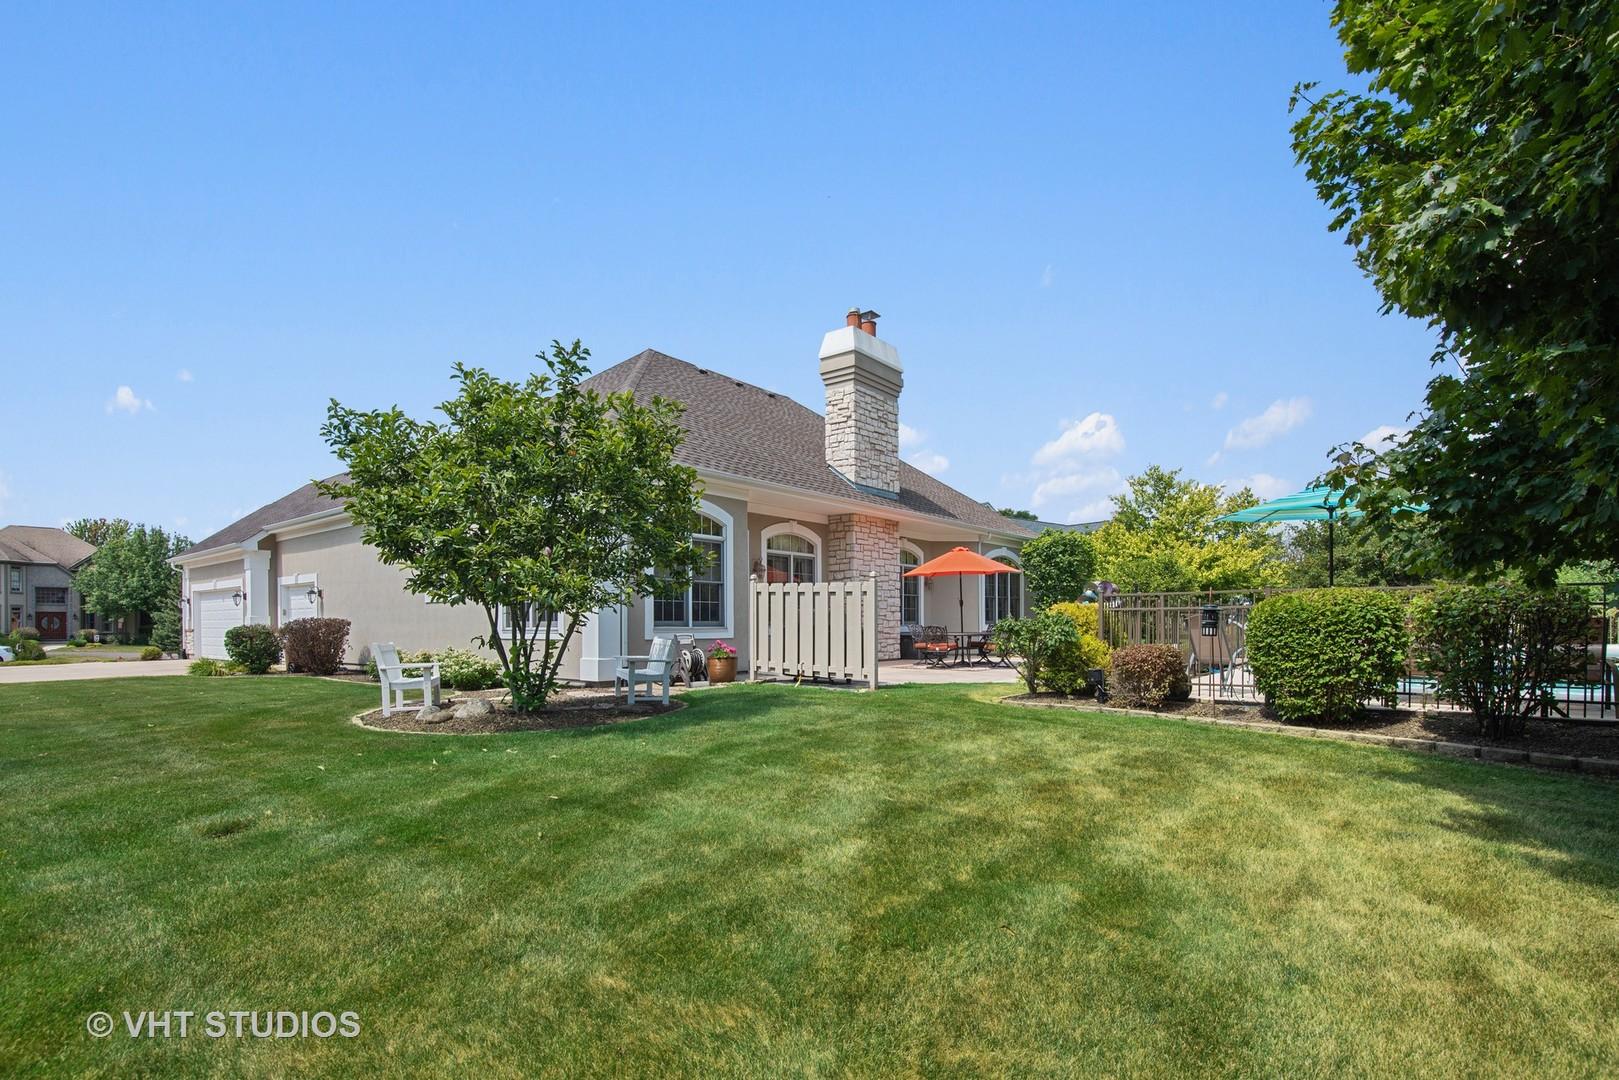 8523 Trevino, Lakewood, Illinois, 60014